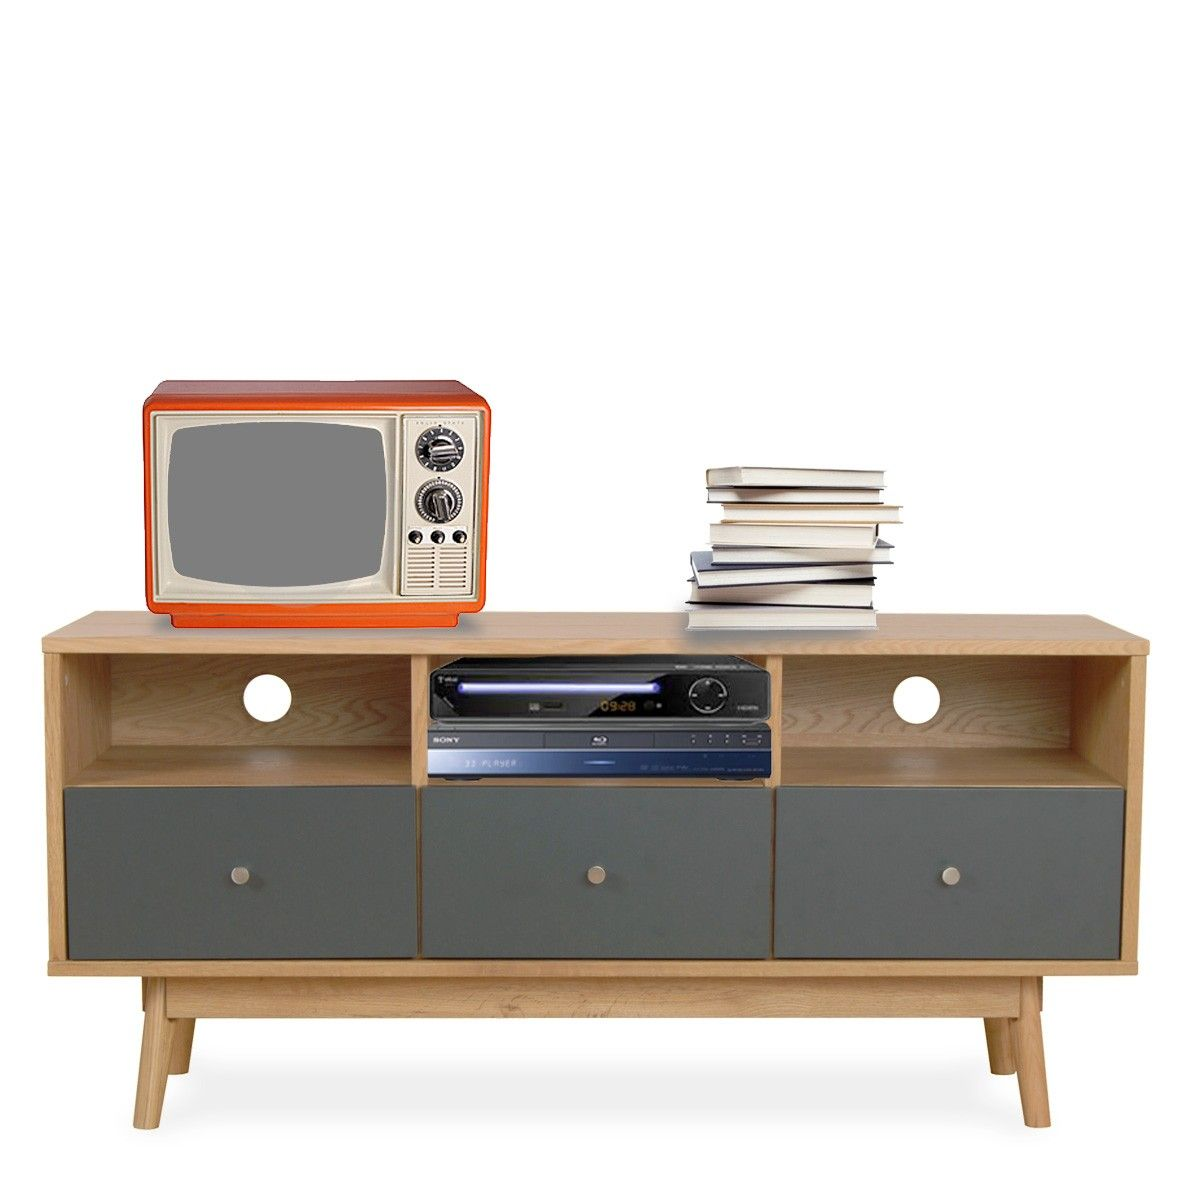 Meuble Tv Design Scandinave 3 Tiroirs Gris Et Bois Skoll Gris Gris